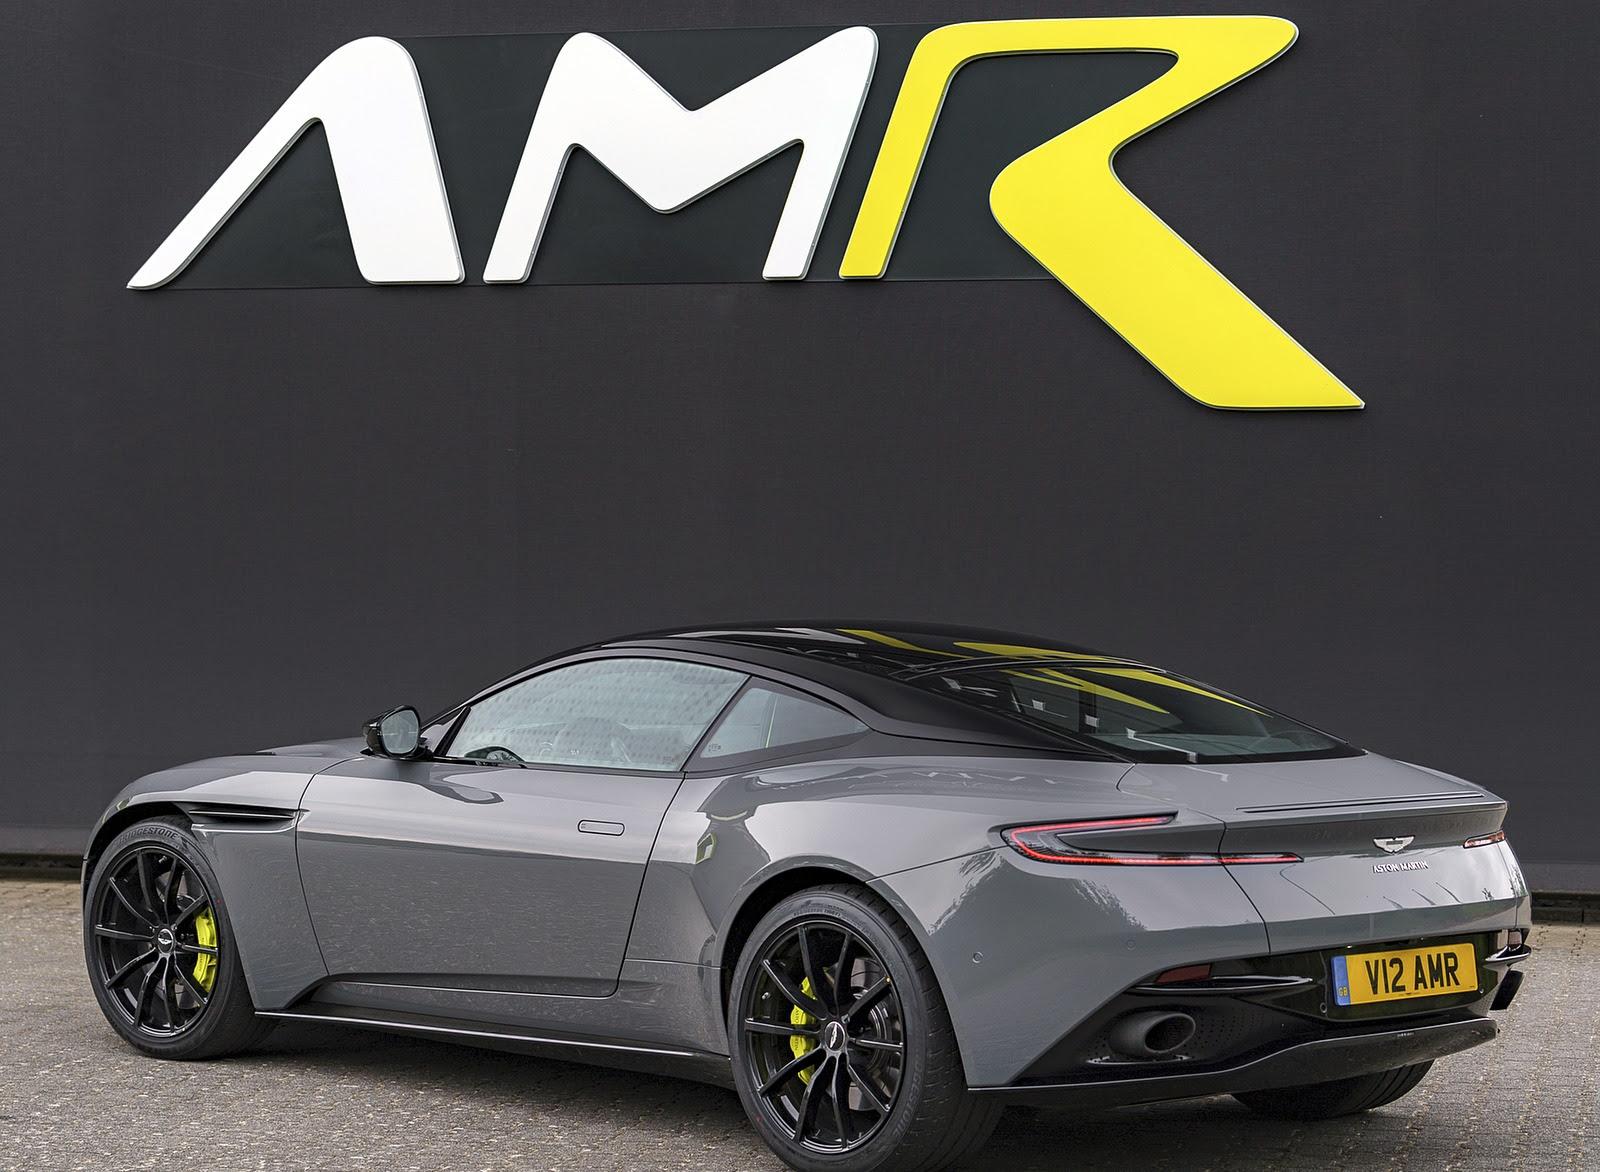 2019 Aston Martin Db11 Amr Color China Grey Rear Three Quarter Wallpapers 31 Newcarcars